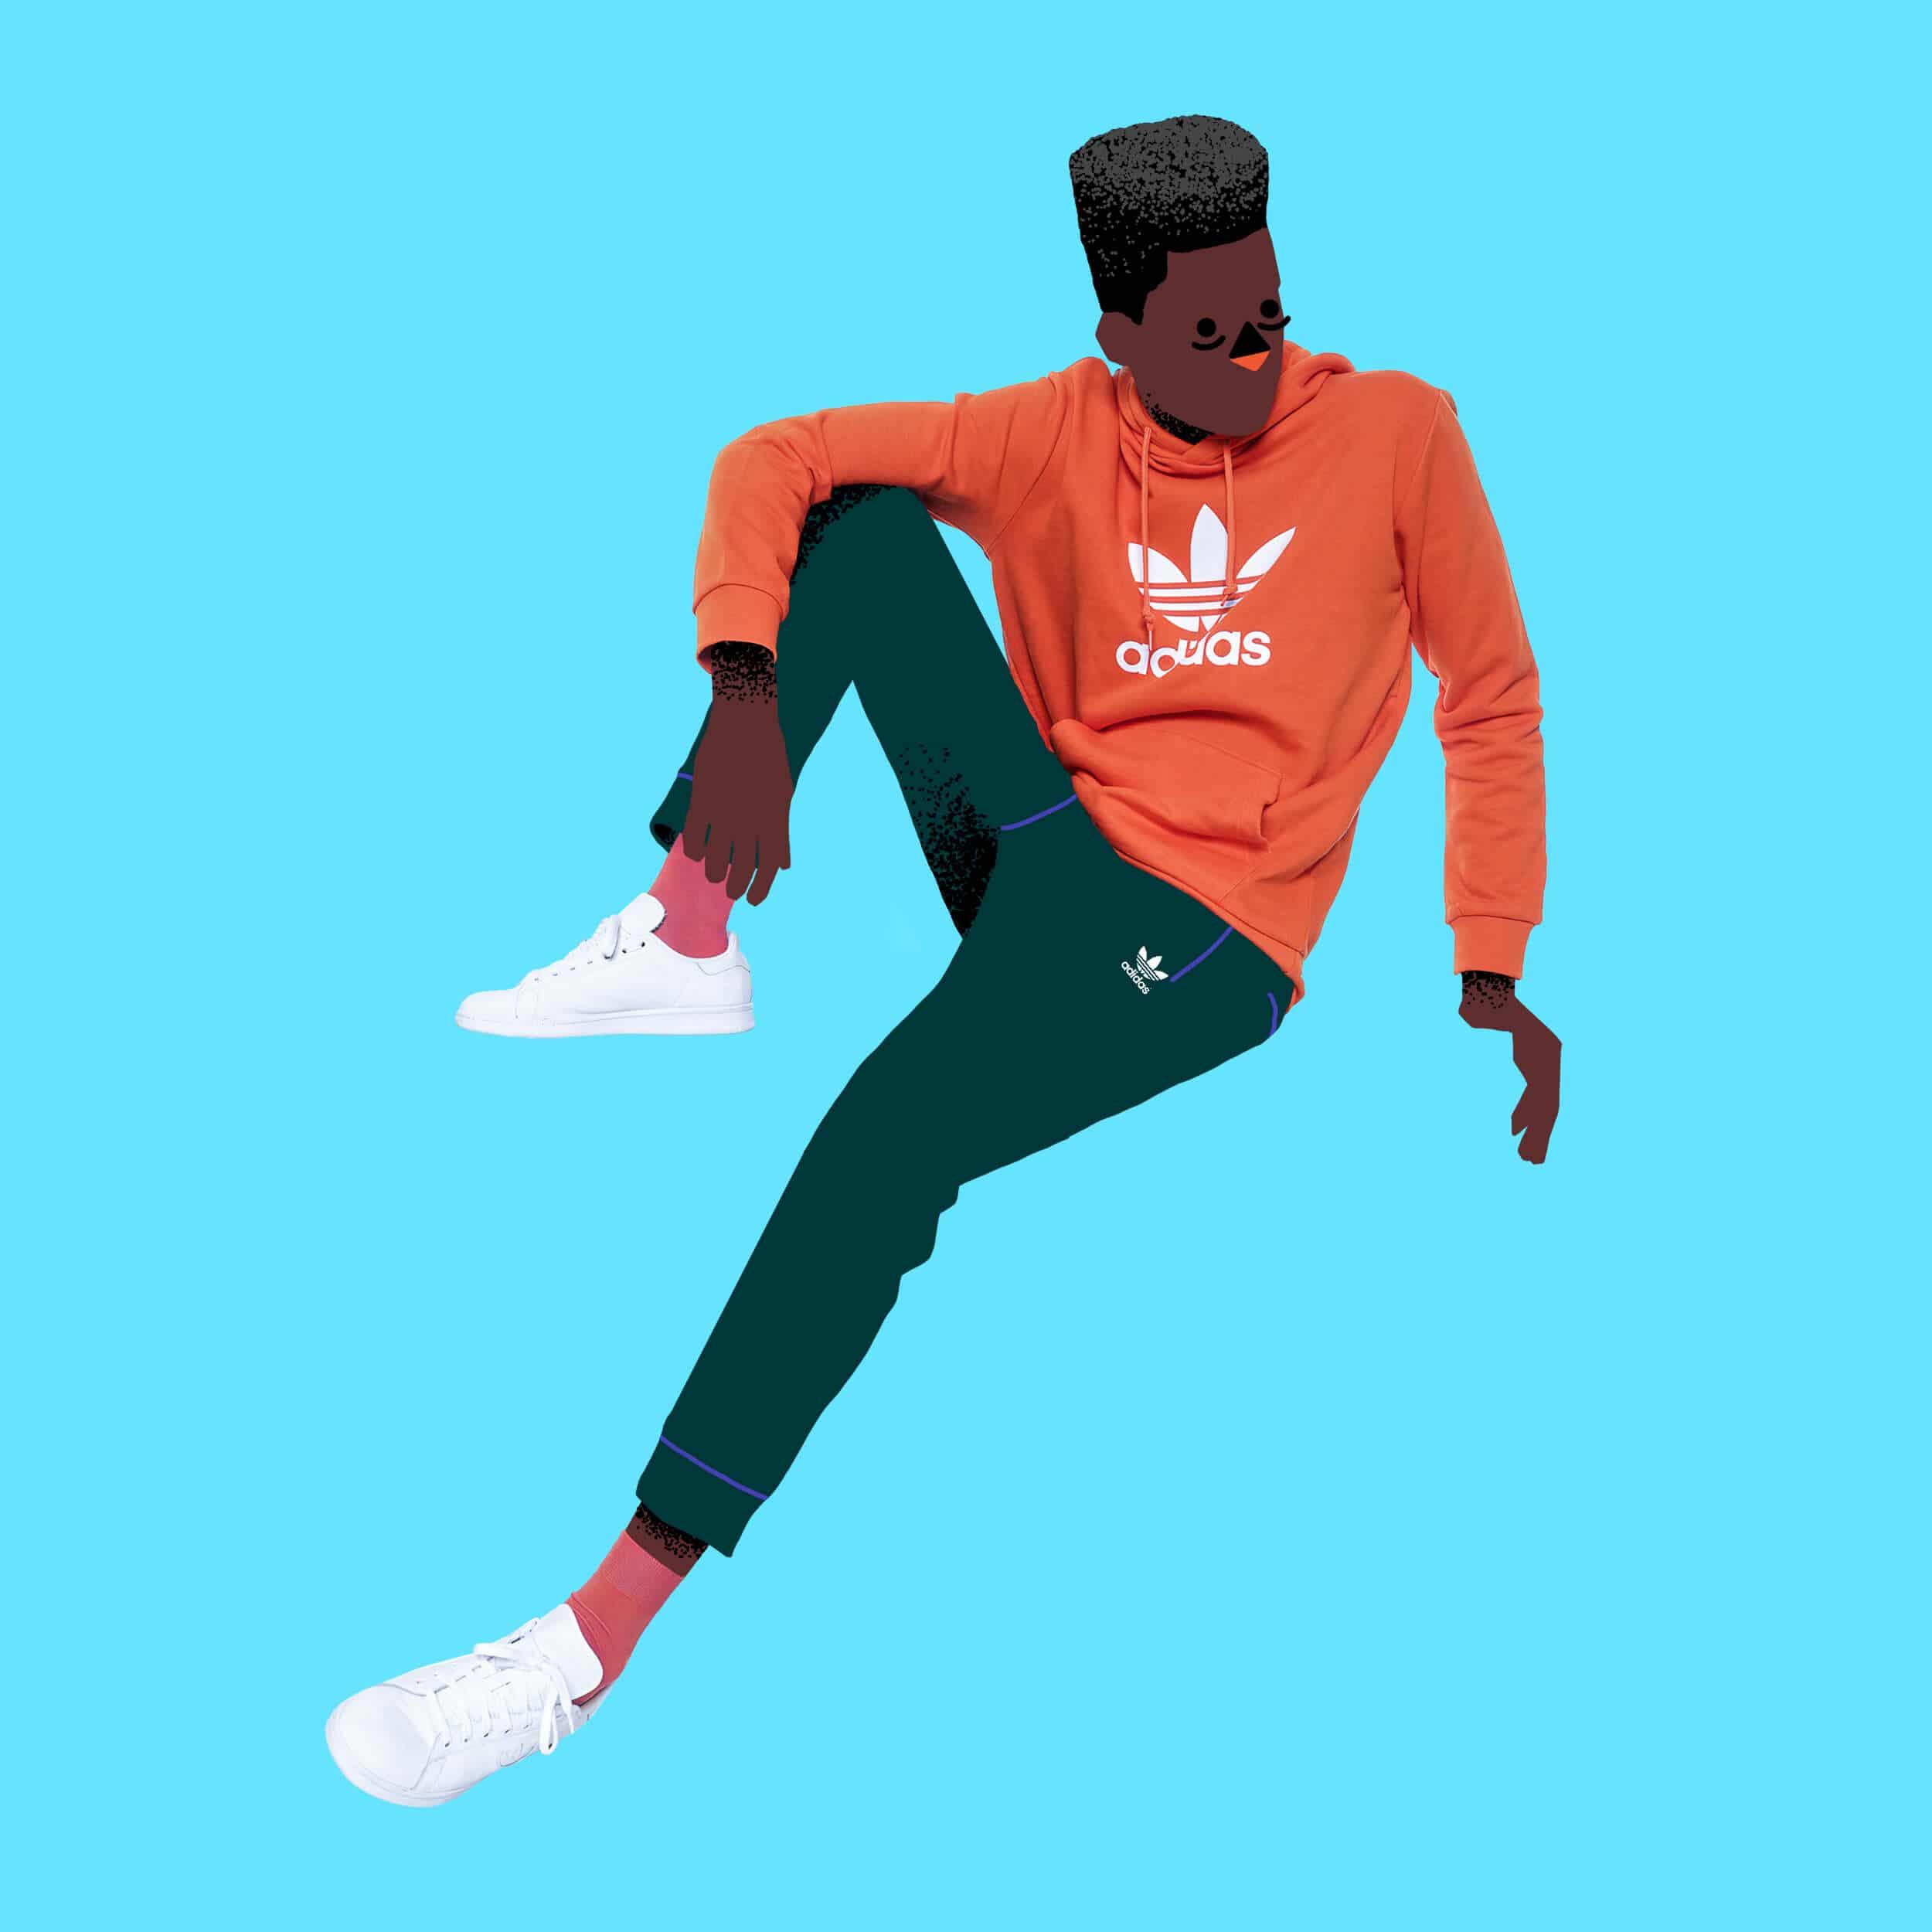 Collab_Adidas_01_ilustra